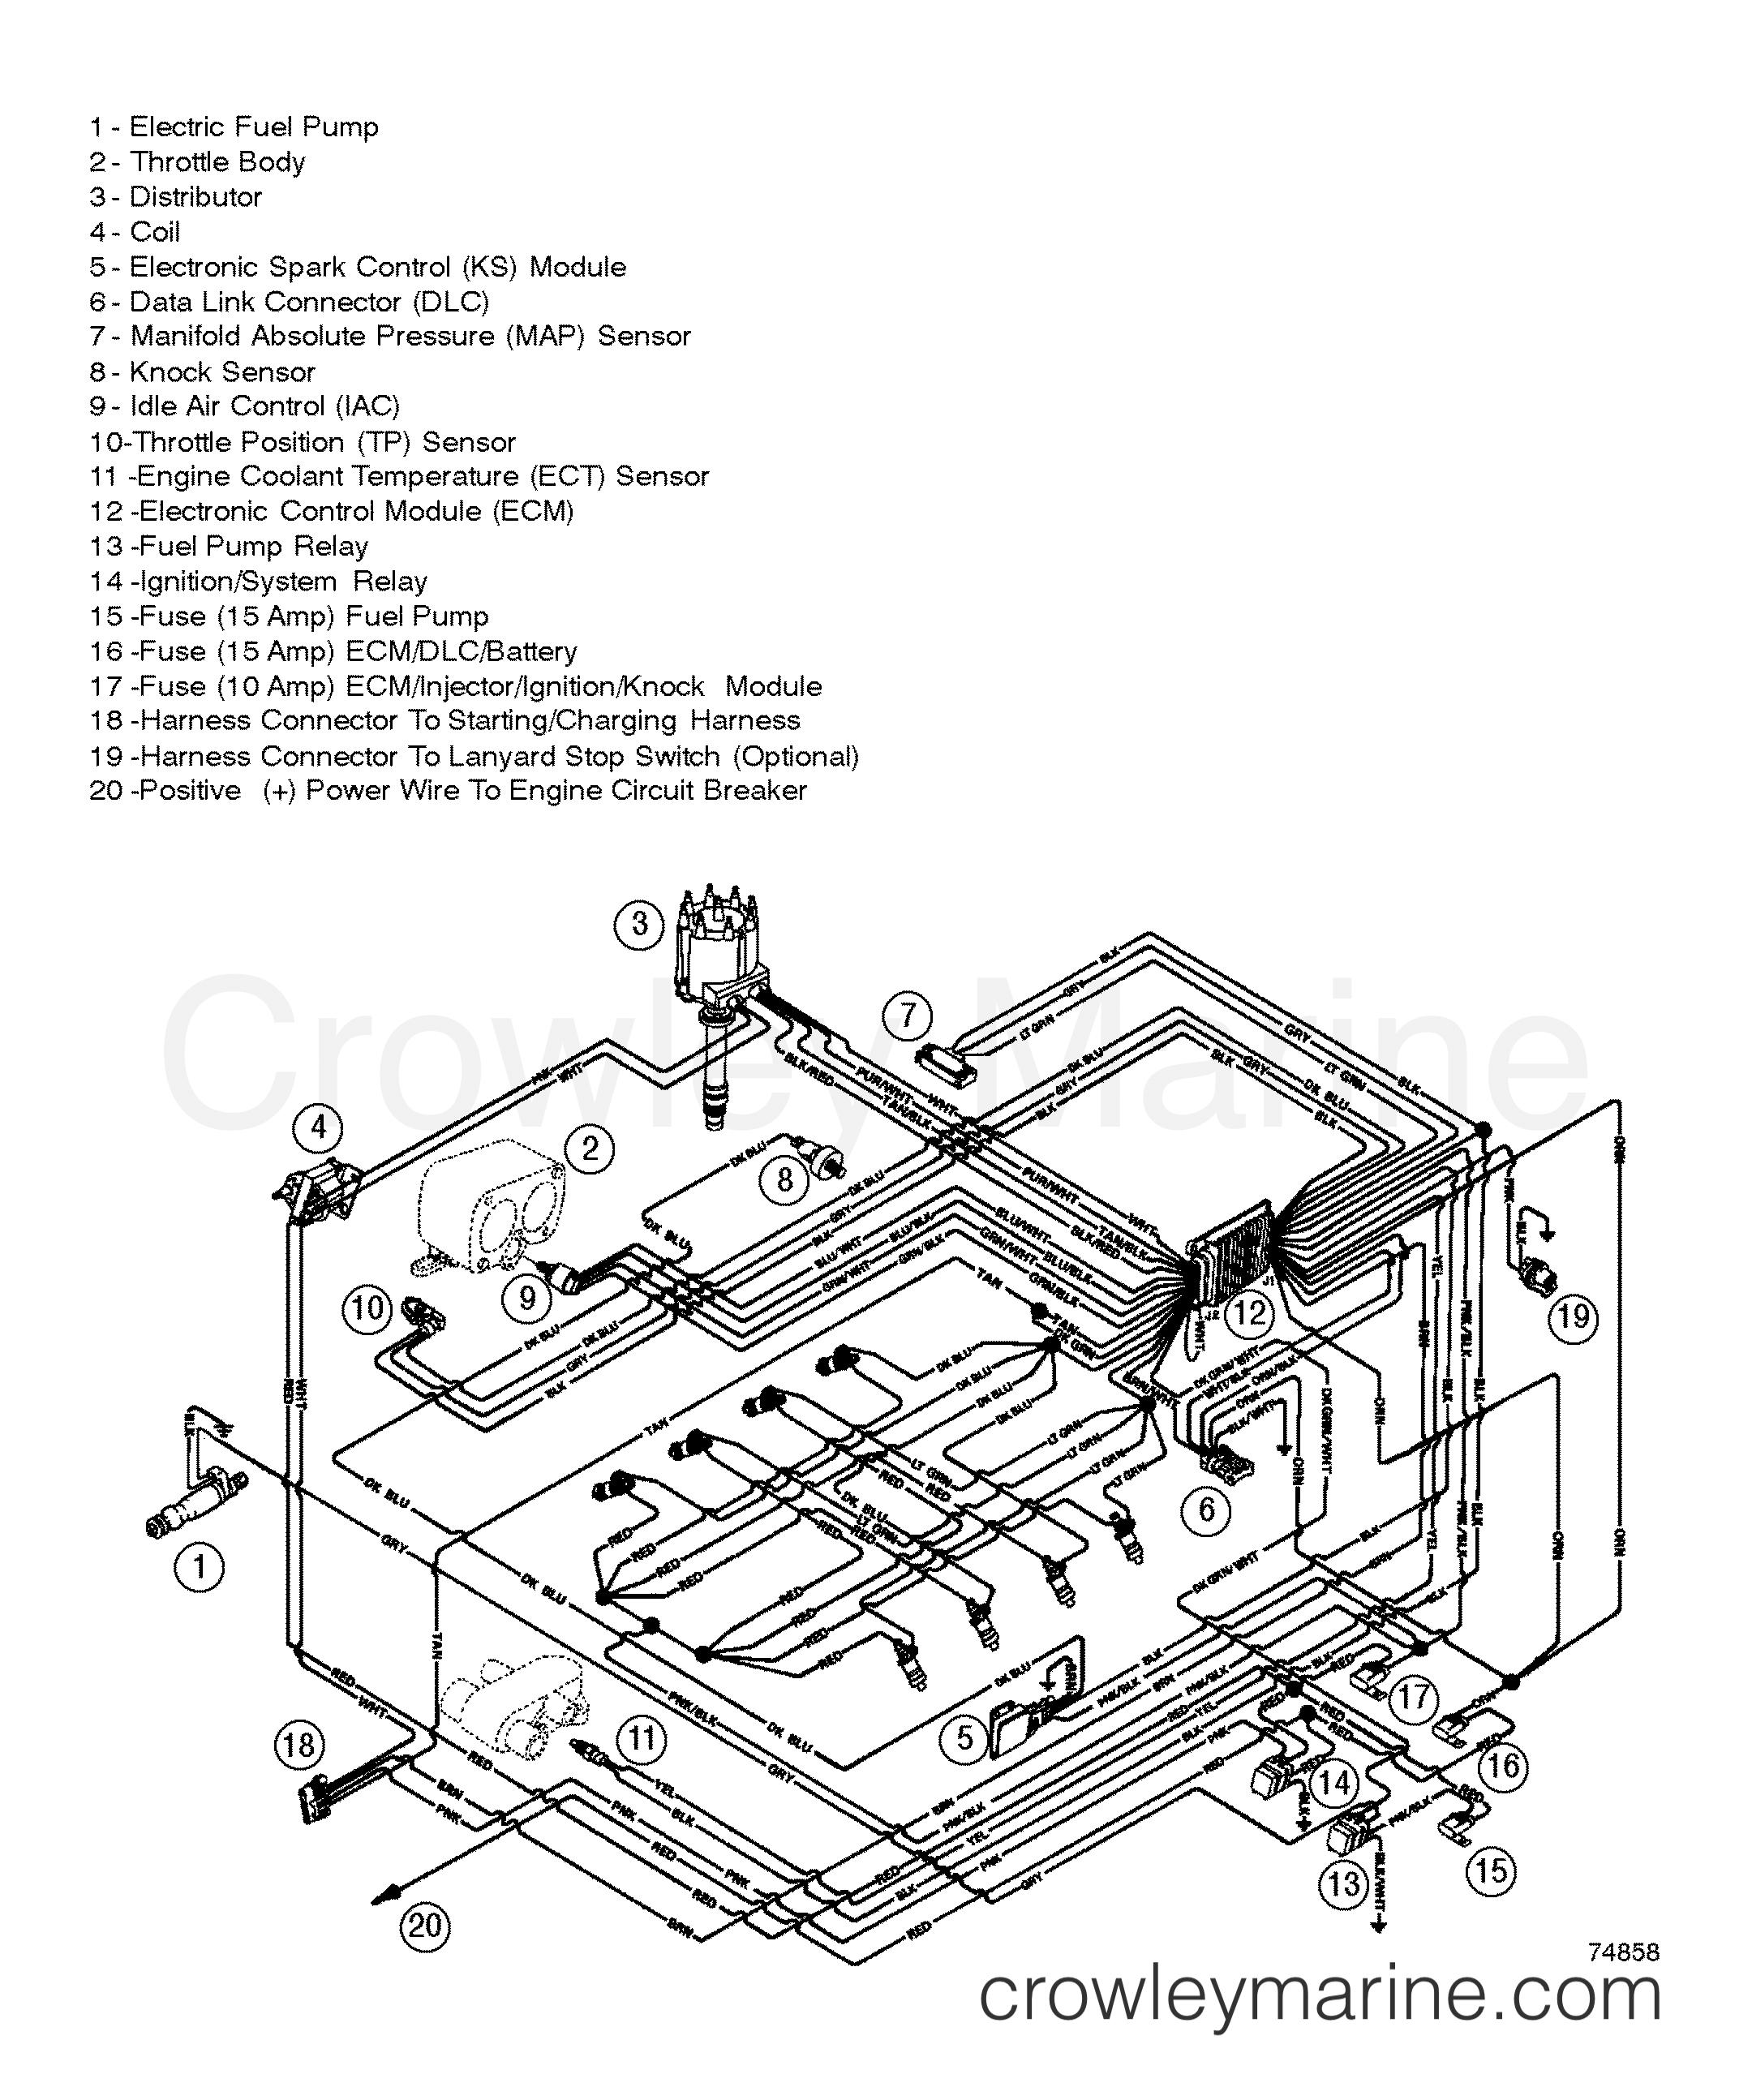 Mercury Verado 350 Wiring Diagram Manual Of Harness Efi 1996 Inboard Engine Mag Blk Rh Crowleymarine Com